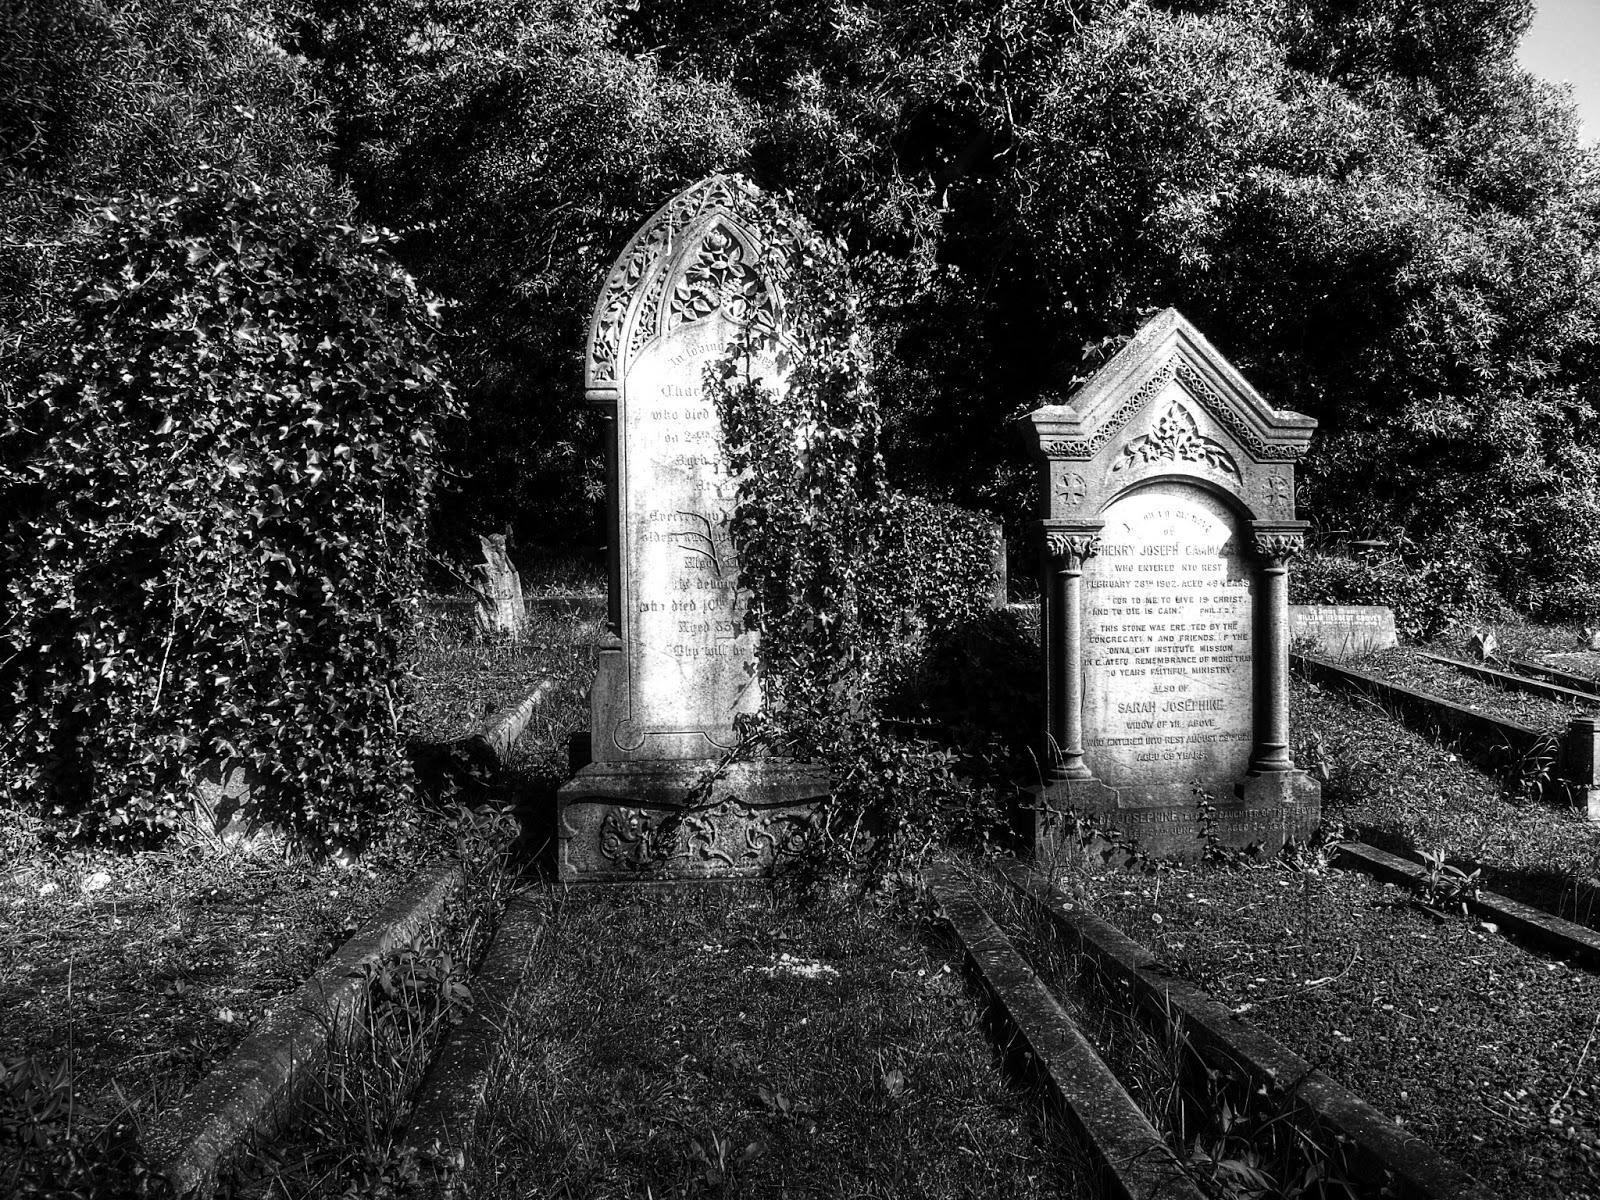 [42+] Spooky Graveyard Wallpaper on WallpaperSafari